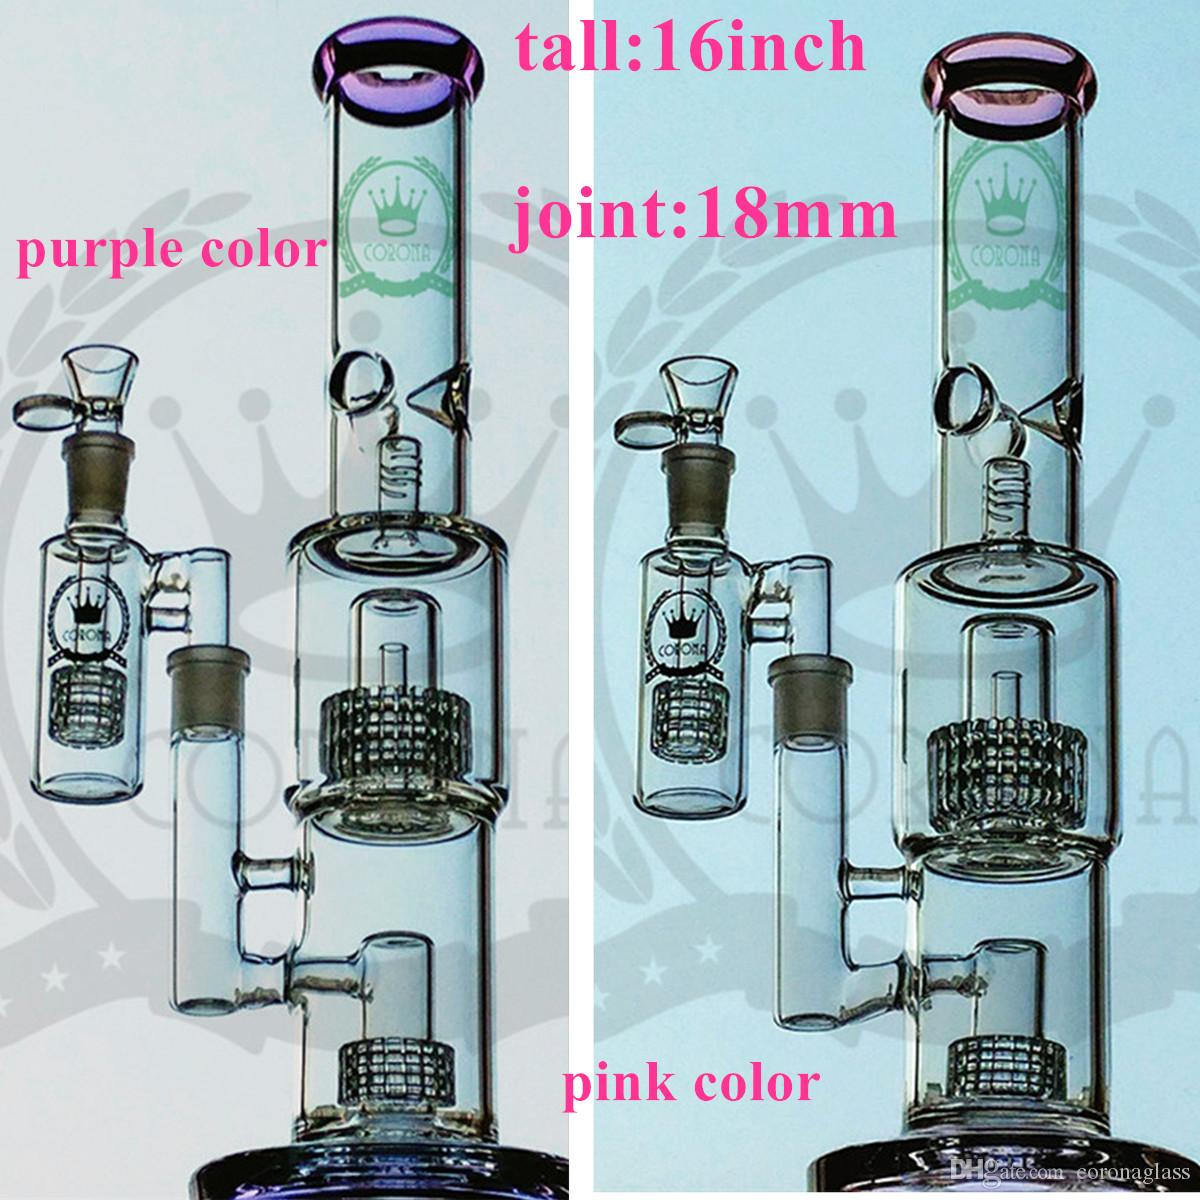 Bong New Design clavos Bongs Glass Water Pipes Bongs Pyrex Water Bongs con Colorful Lips 18mm Joint Beaker Bong Pipas de agua Oil Rigs Bong